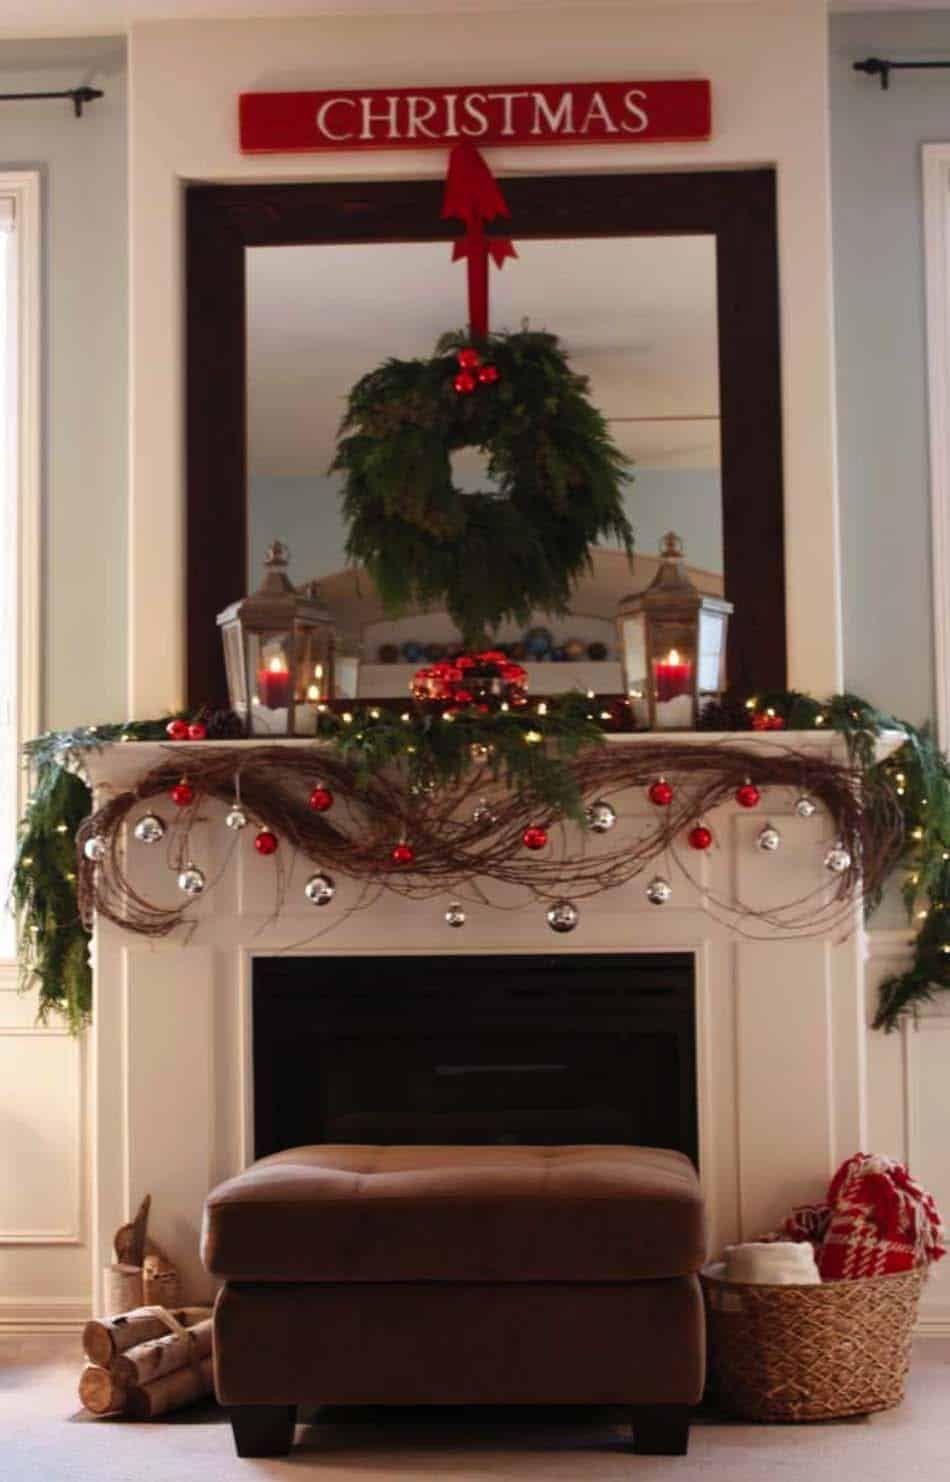 50 Absolutely Fabulous Christmas Mantel Decorating Ideas Christmas Mantel Decorations Christmas Fireplace Christmas Mantels